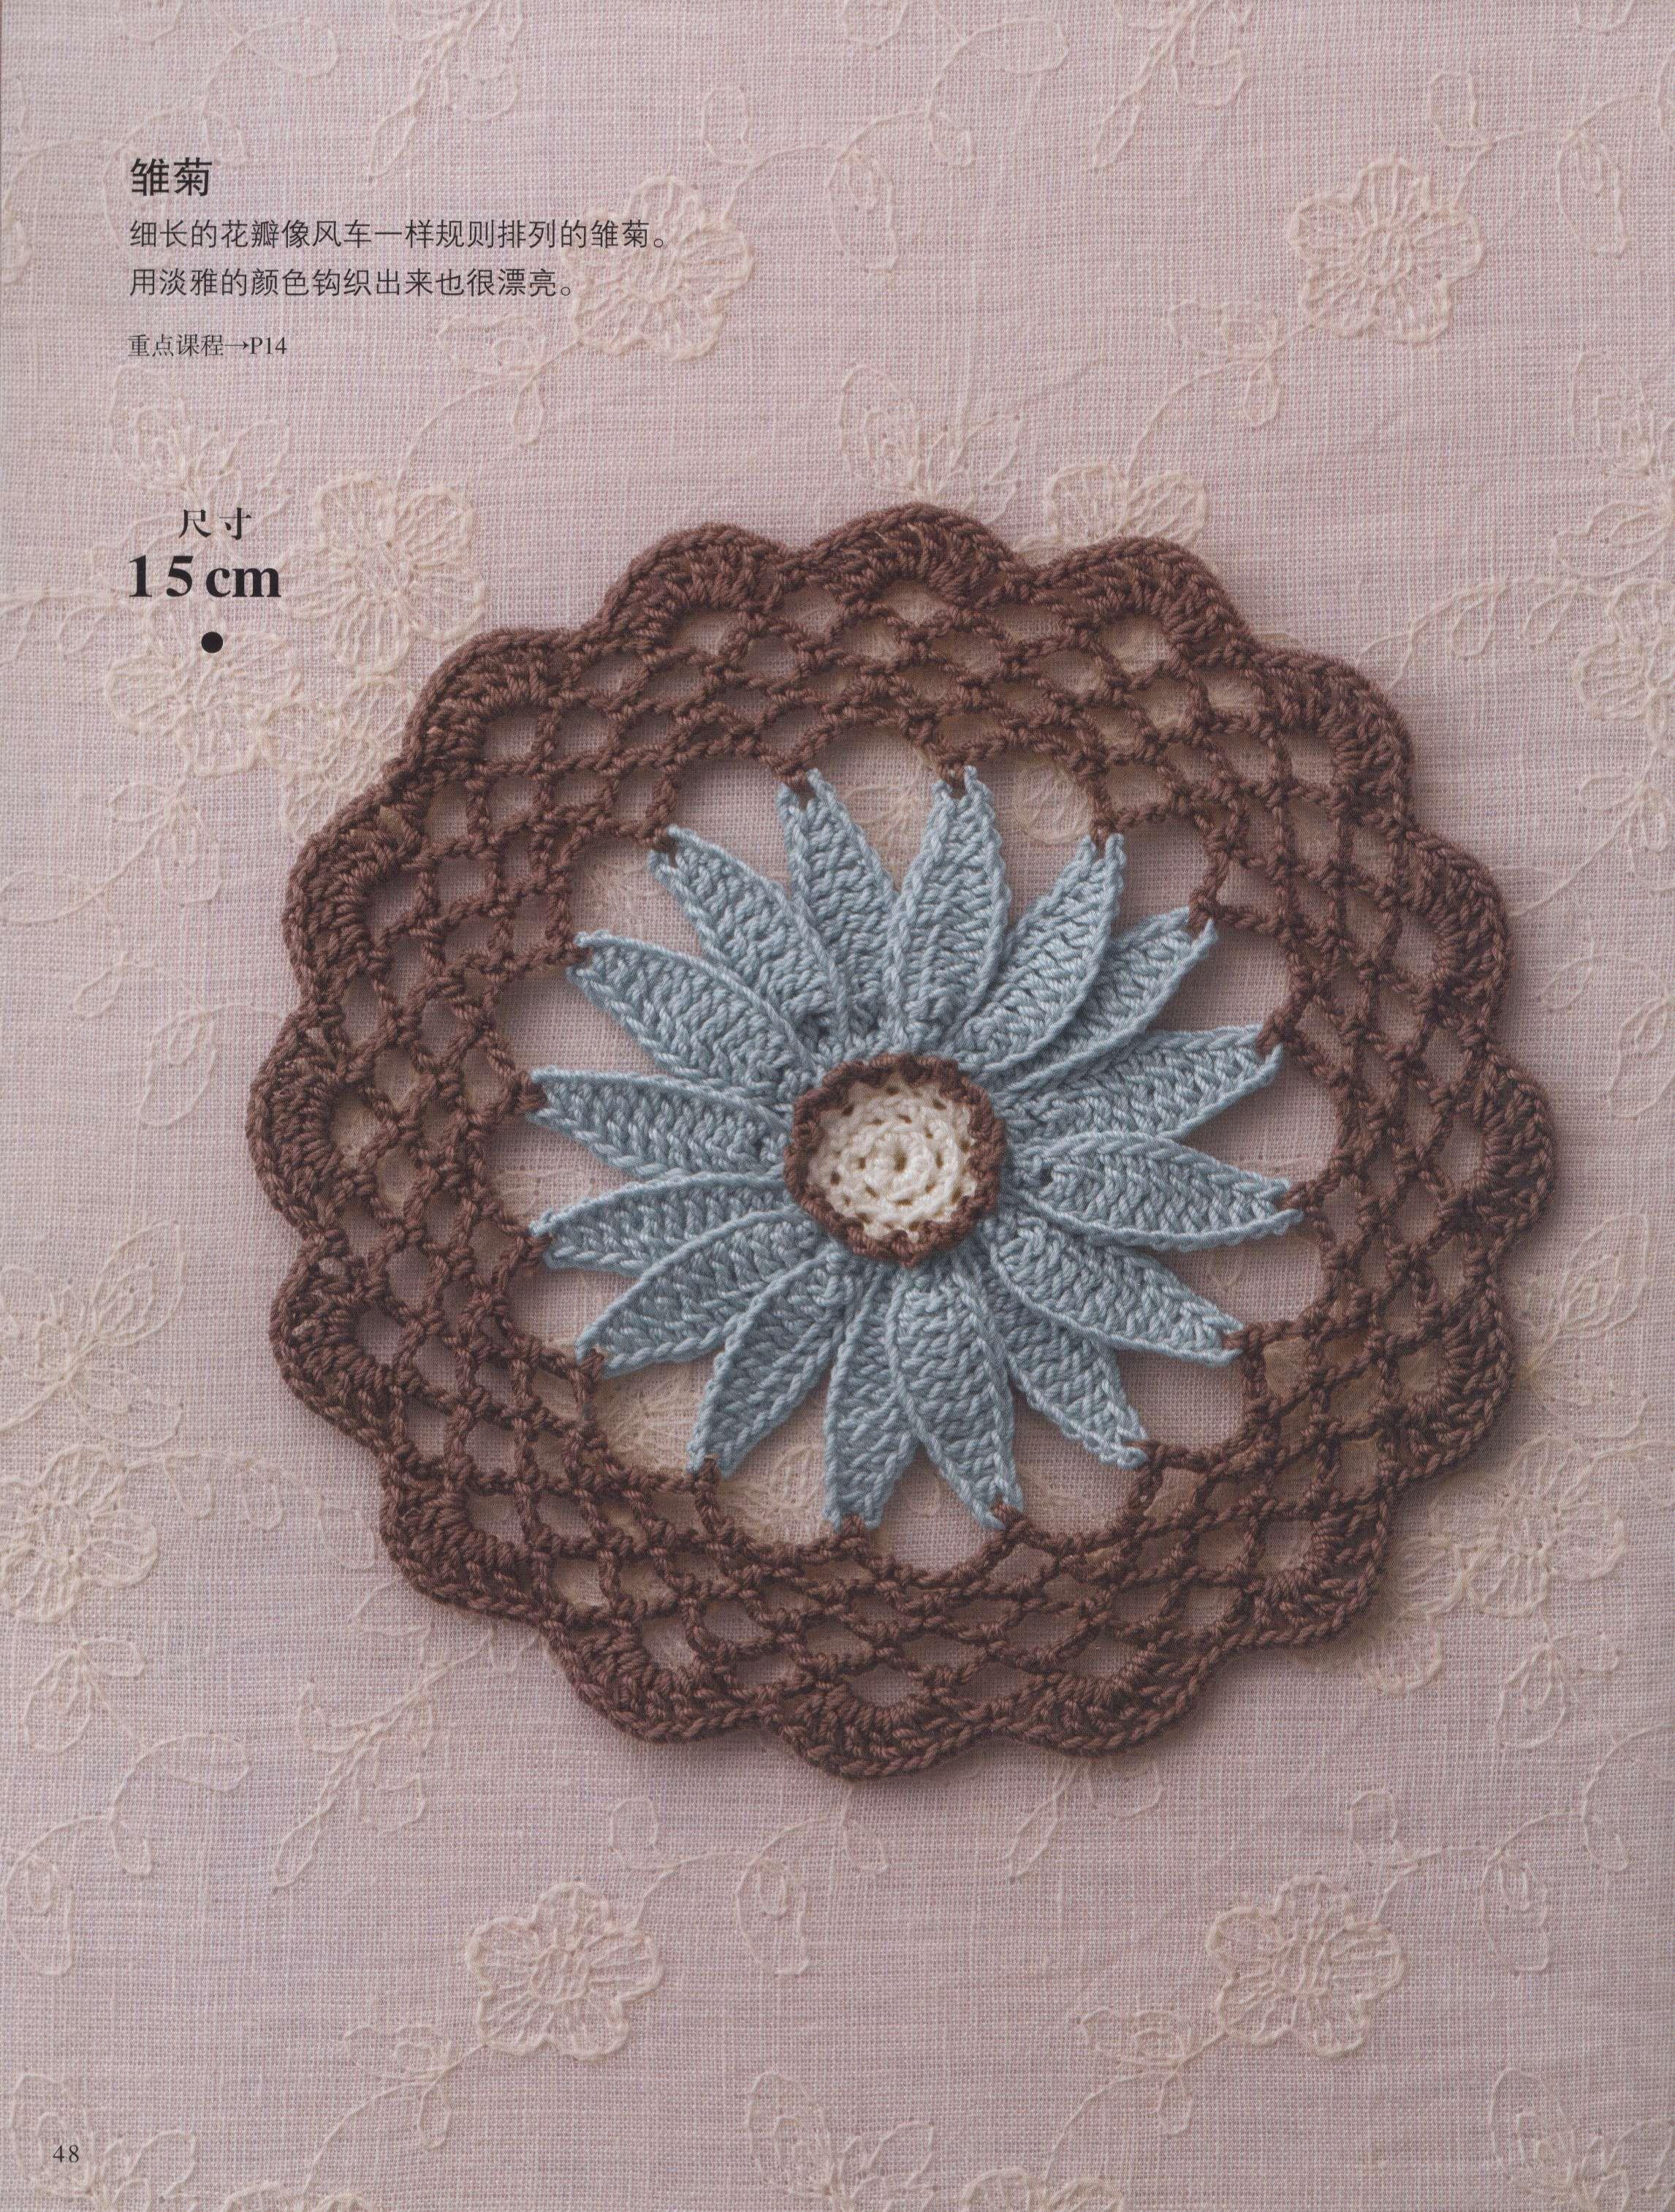 Porta Copos Em Croch De Flor Beverage Coasters Rose Crochet Flores Crochetflowers Pretty Flower Diagram Doiliescrochet Mandalacrochet Flowerscrochet